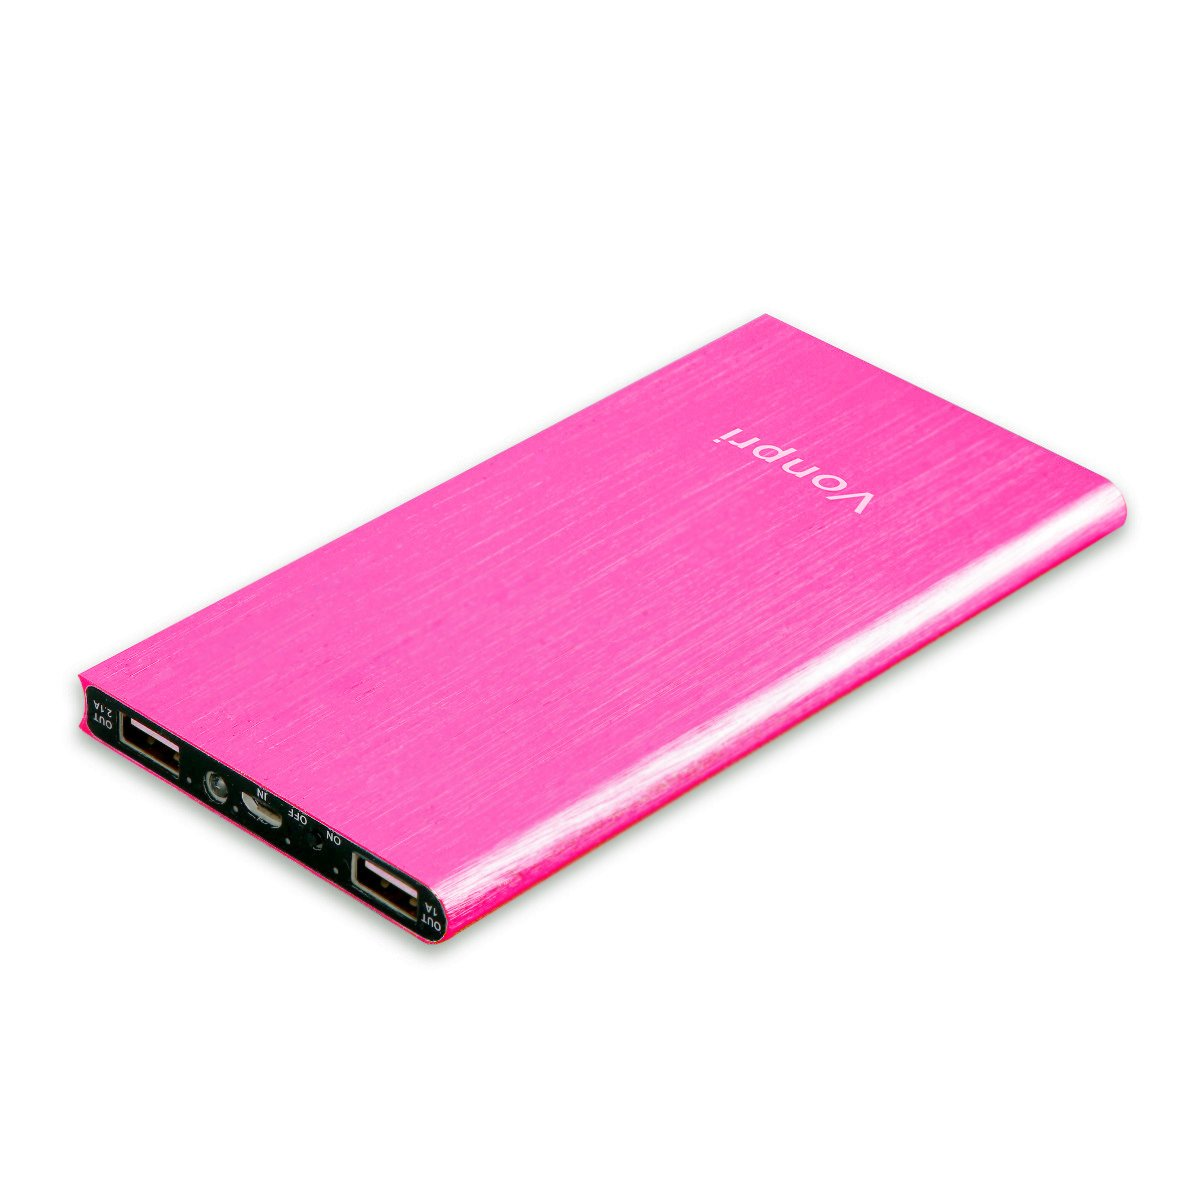 Vonpri mah Batería Externa Portátil Cargador Móvil Power Bank para iPhone iPad